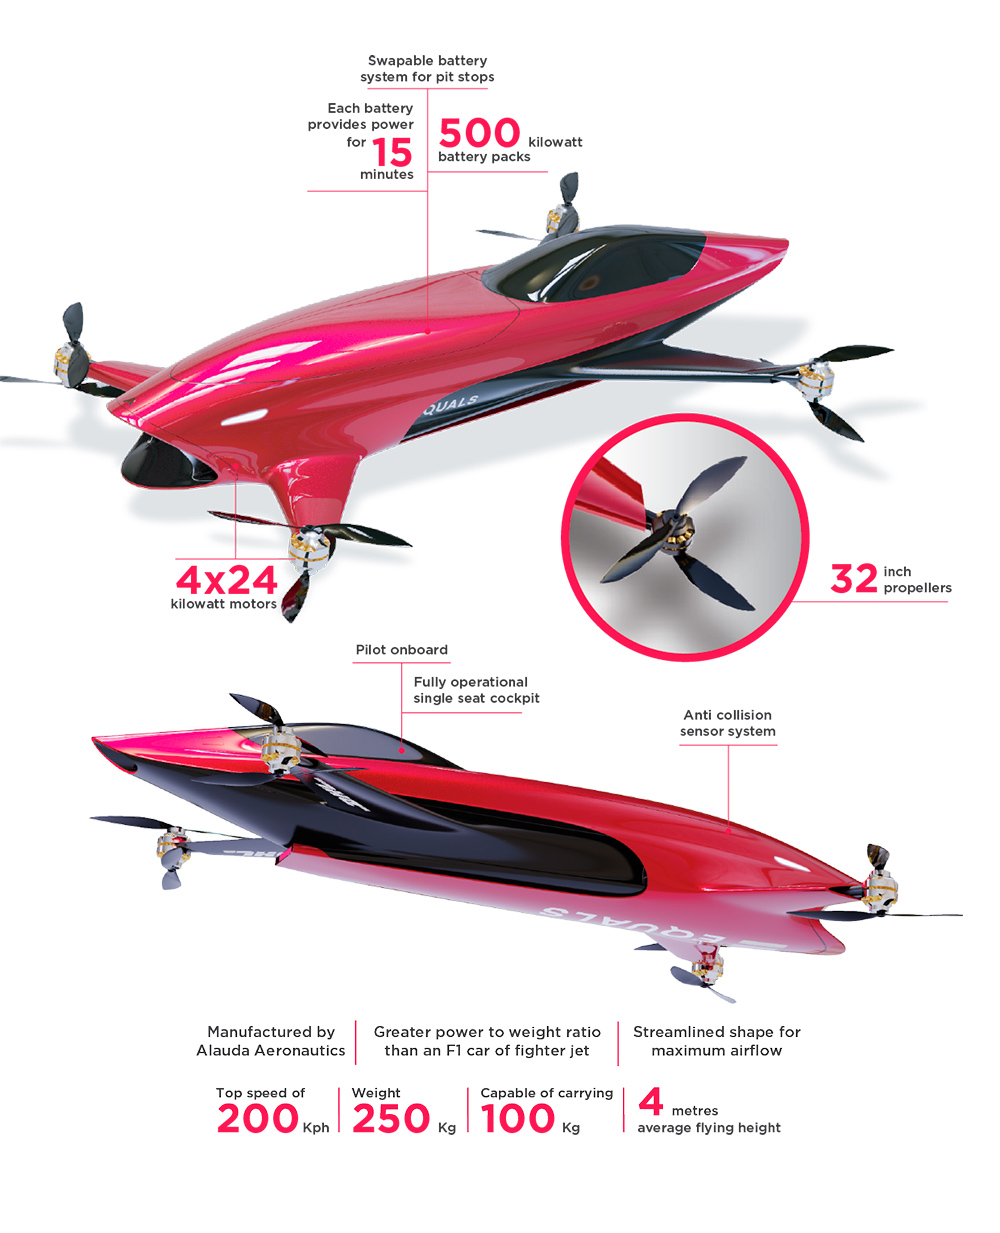 drones-tripulados-soymotor.jpg